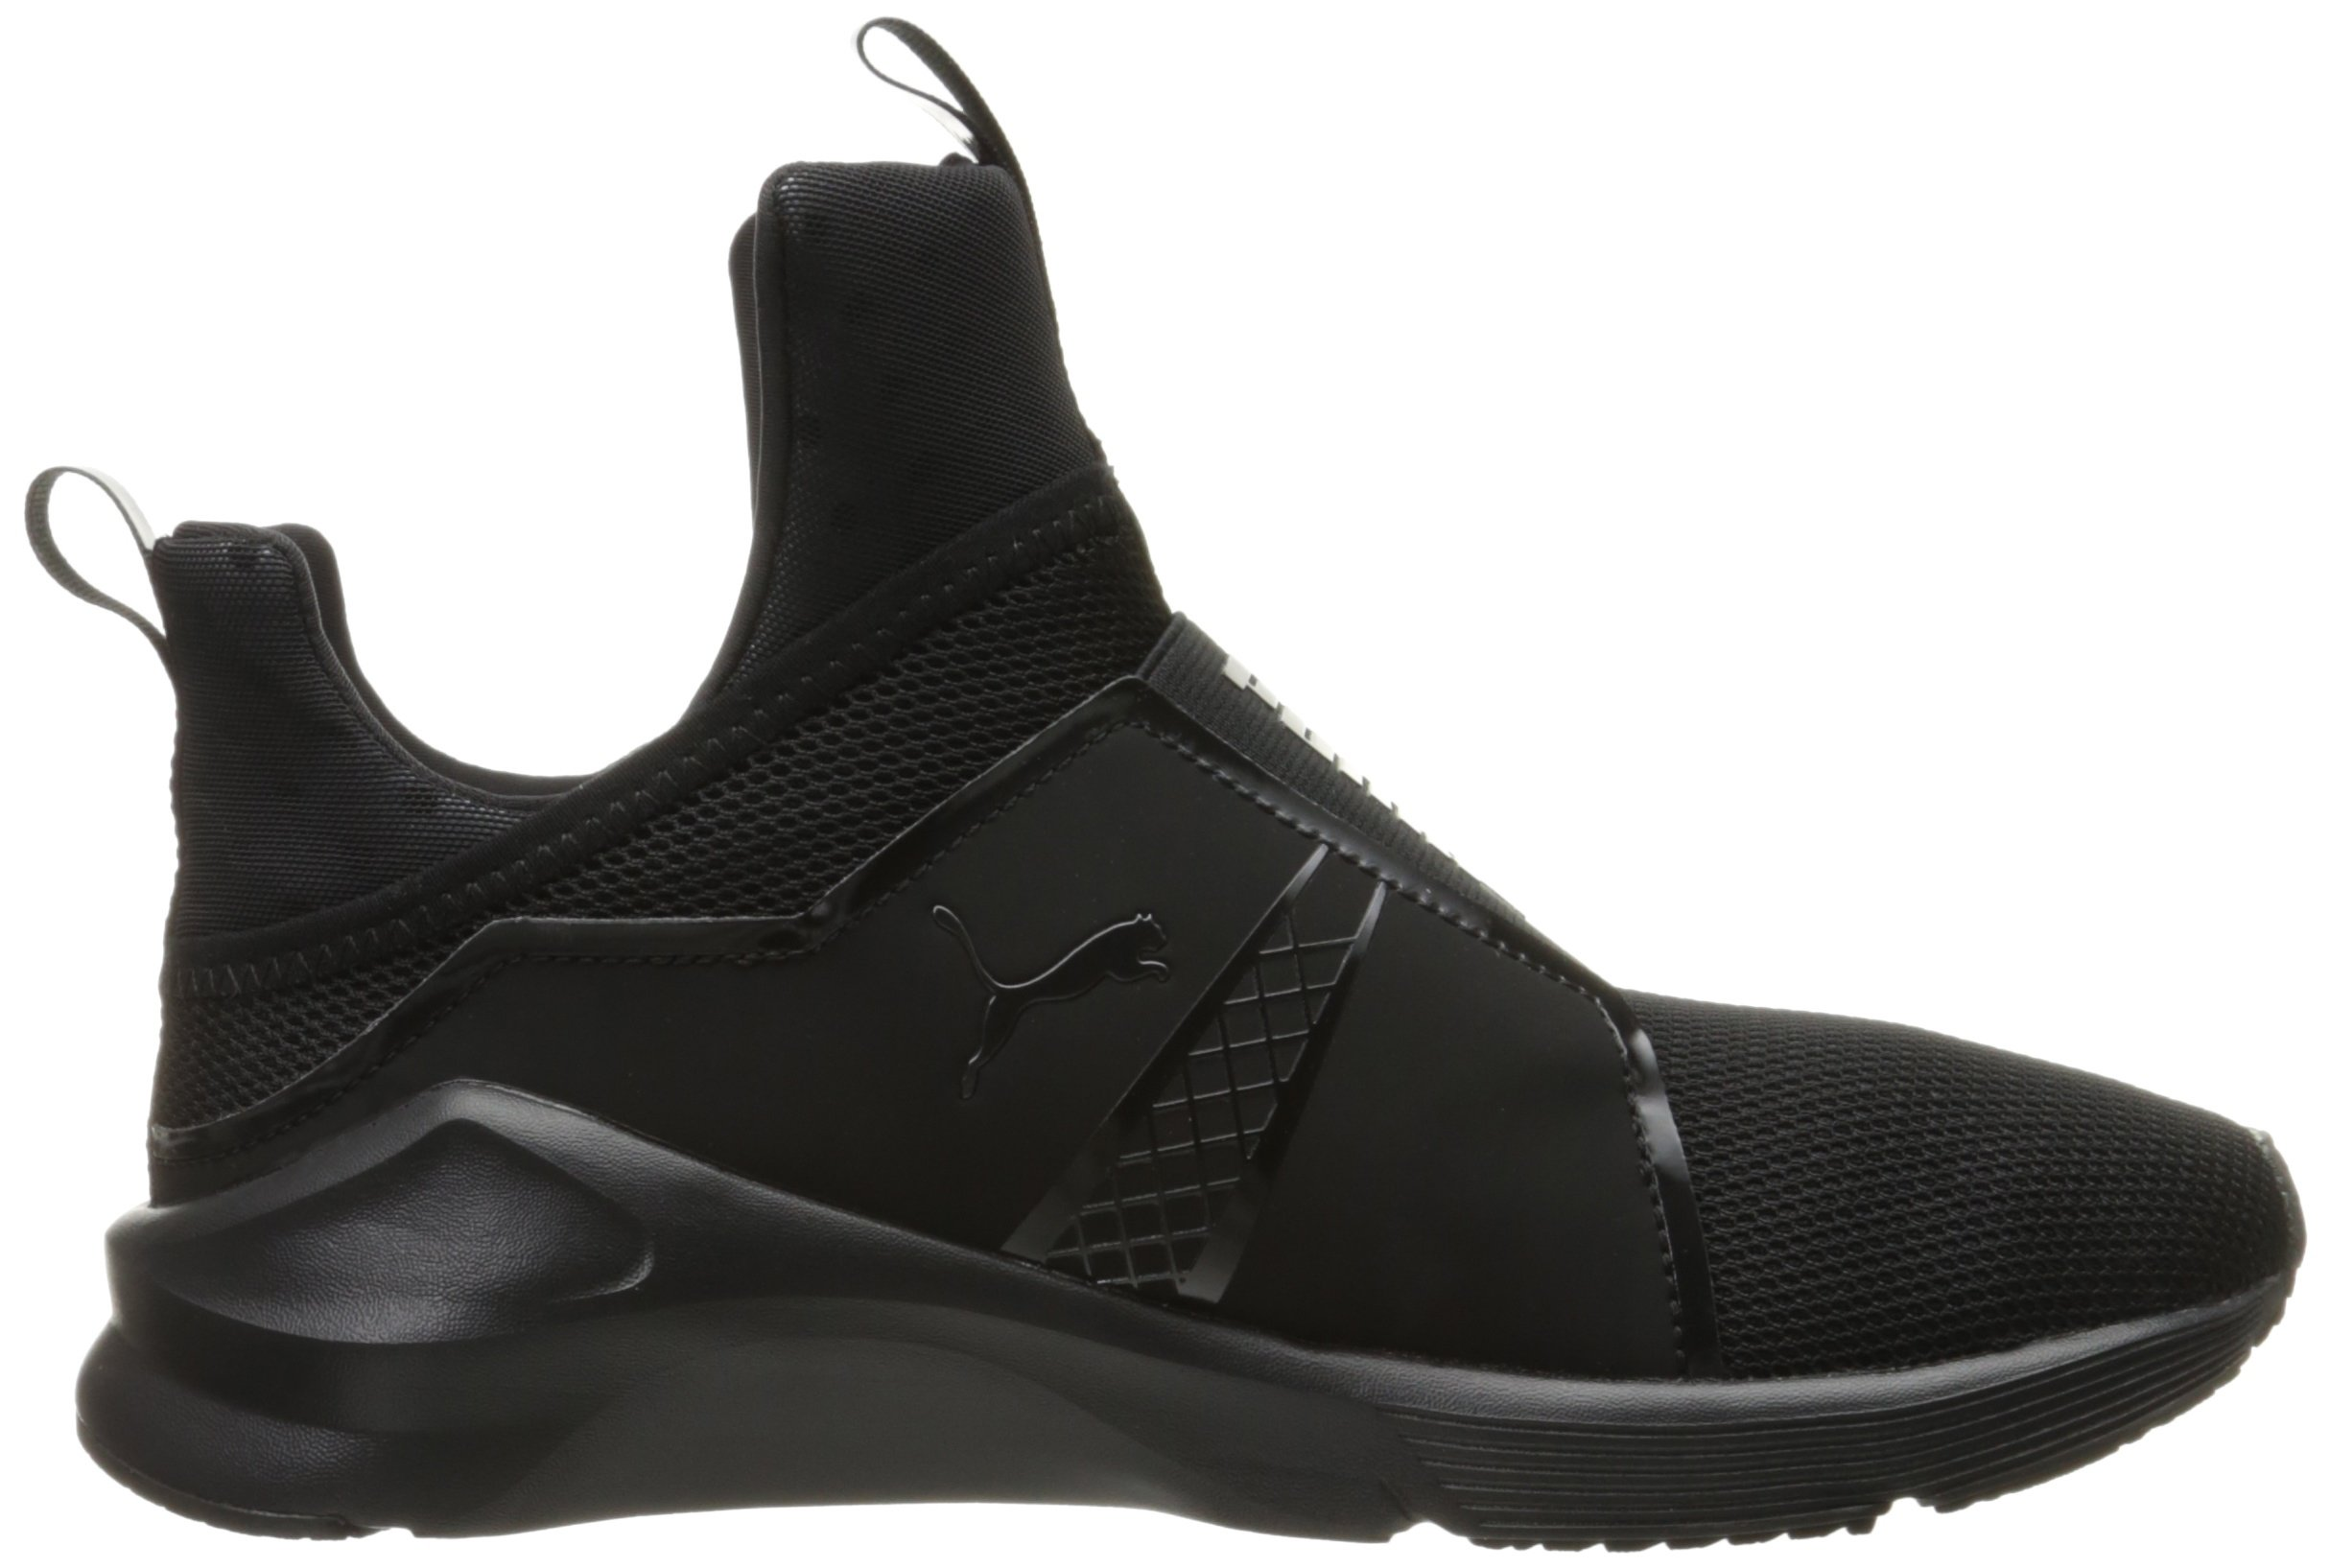 PUMA Women's Fierce Core Cross-Trainer Shoe, Black Black, 9 M US by PUMA (Image #7)